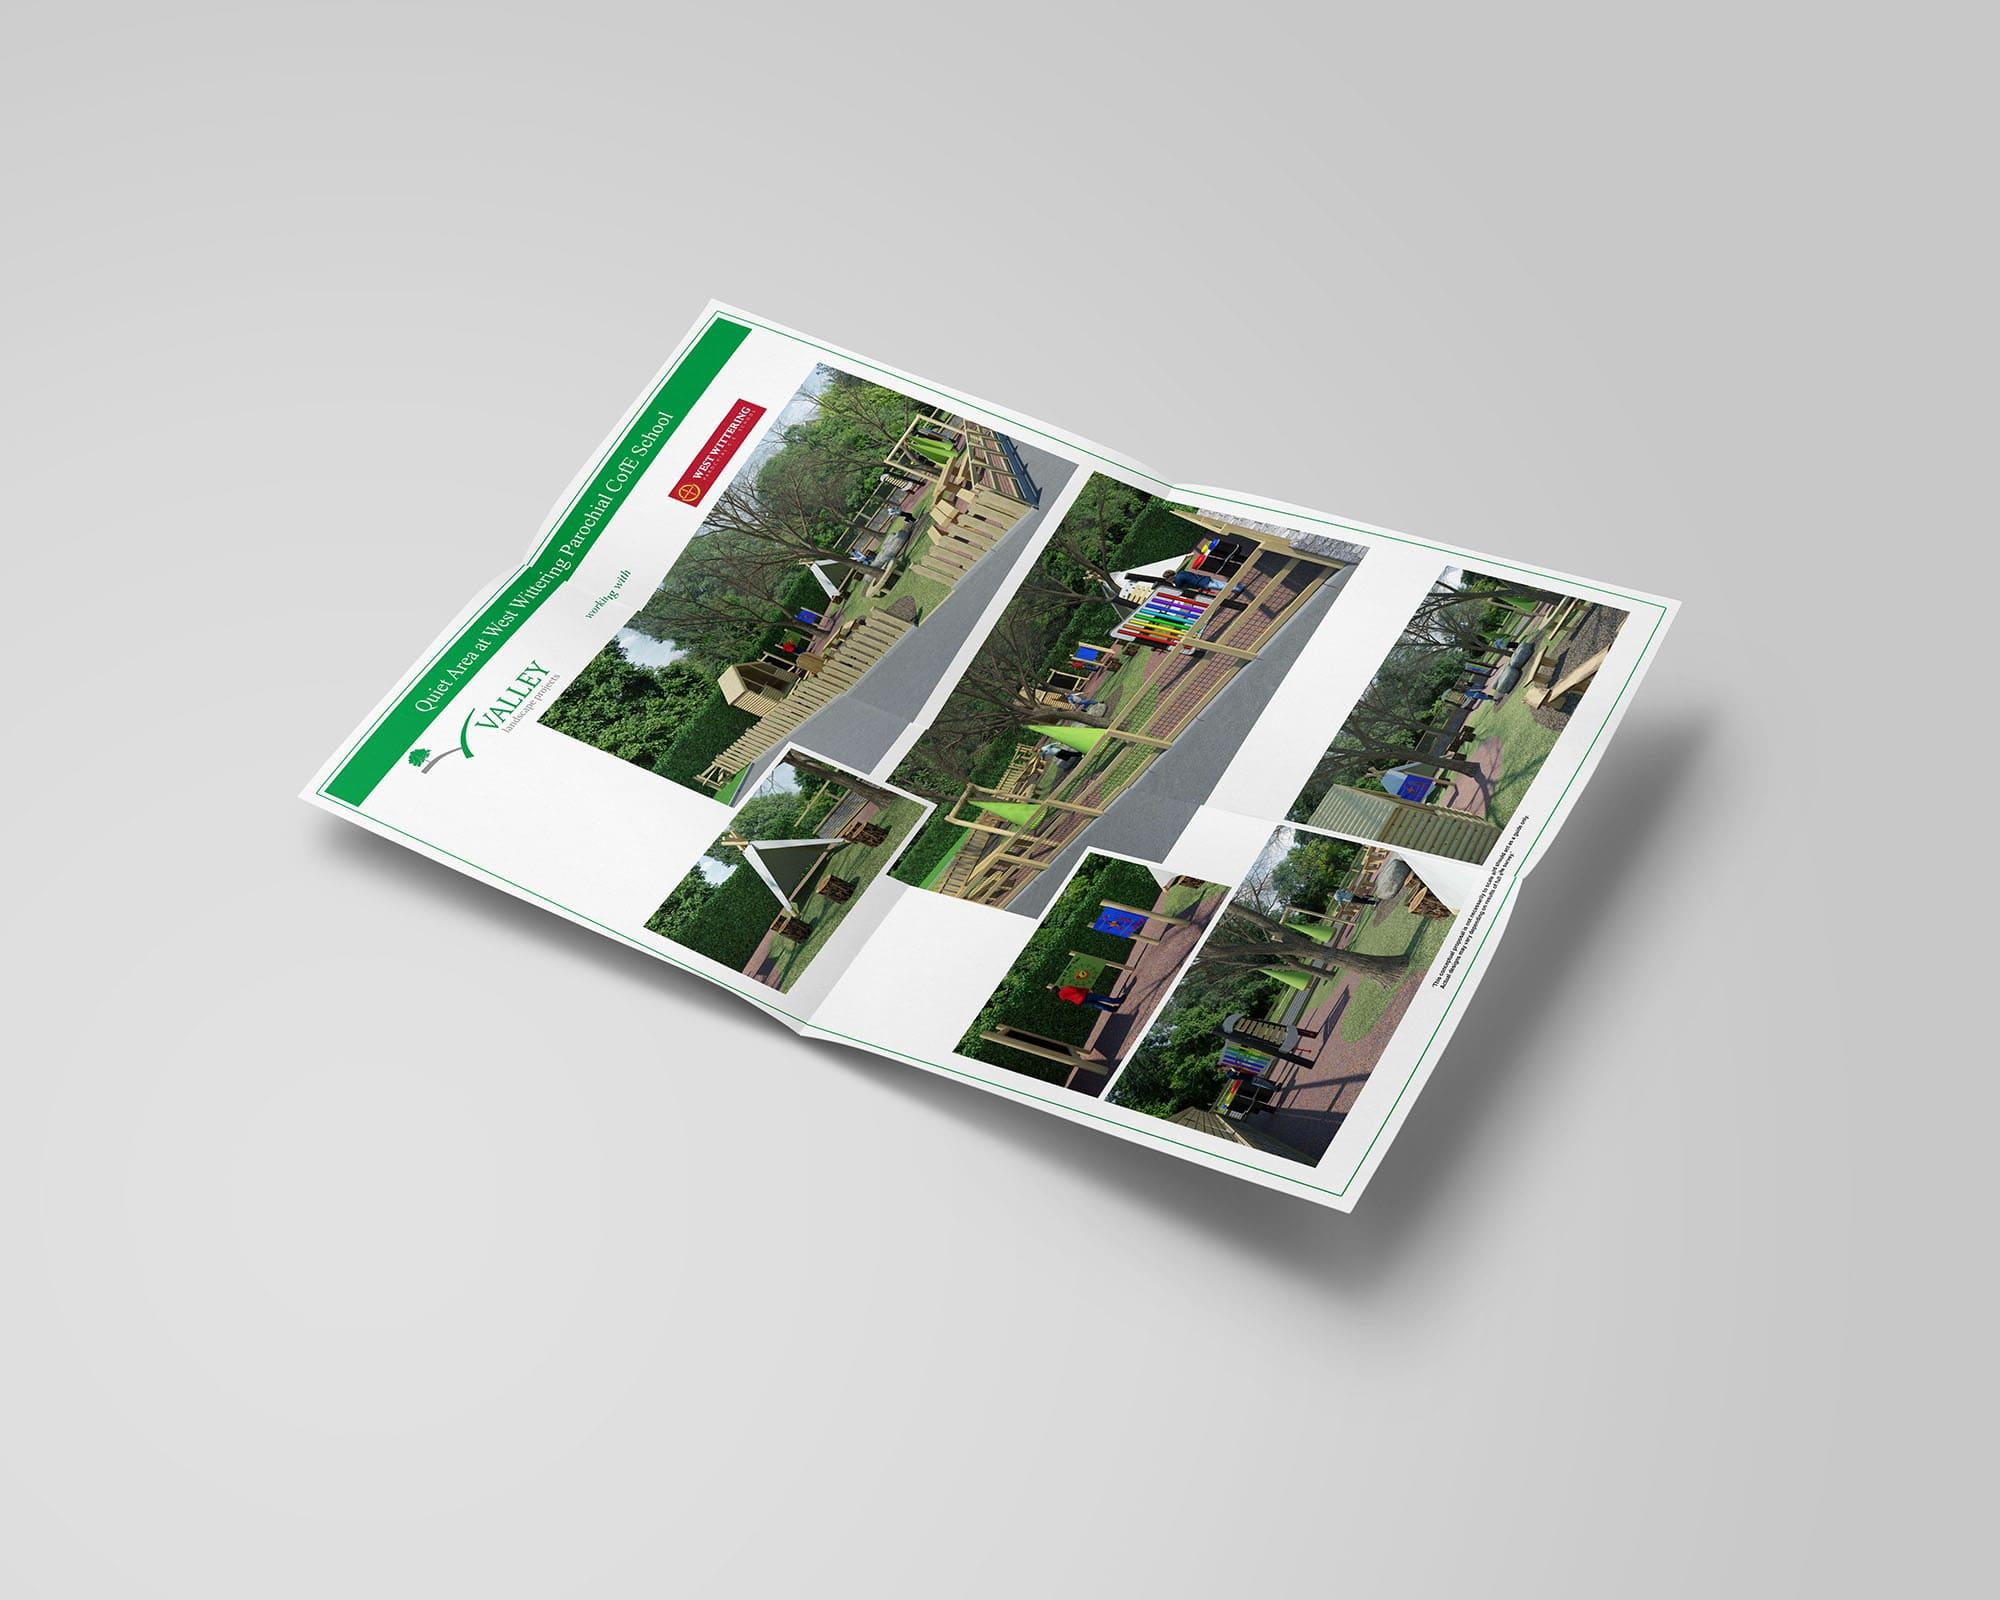 West_Wittering_Design_2-min.jpg